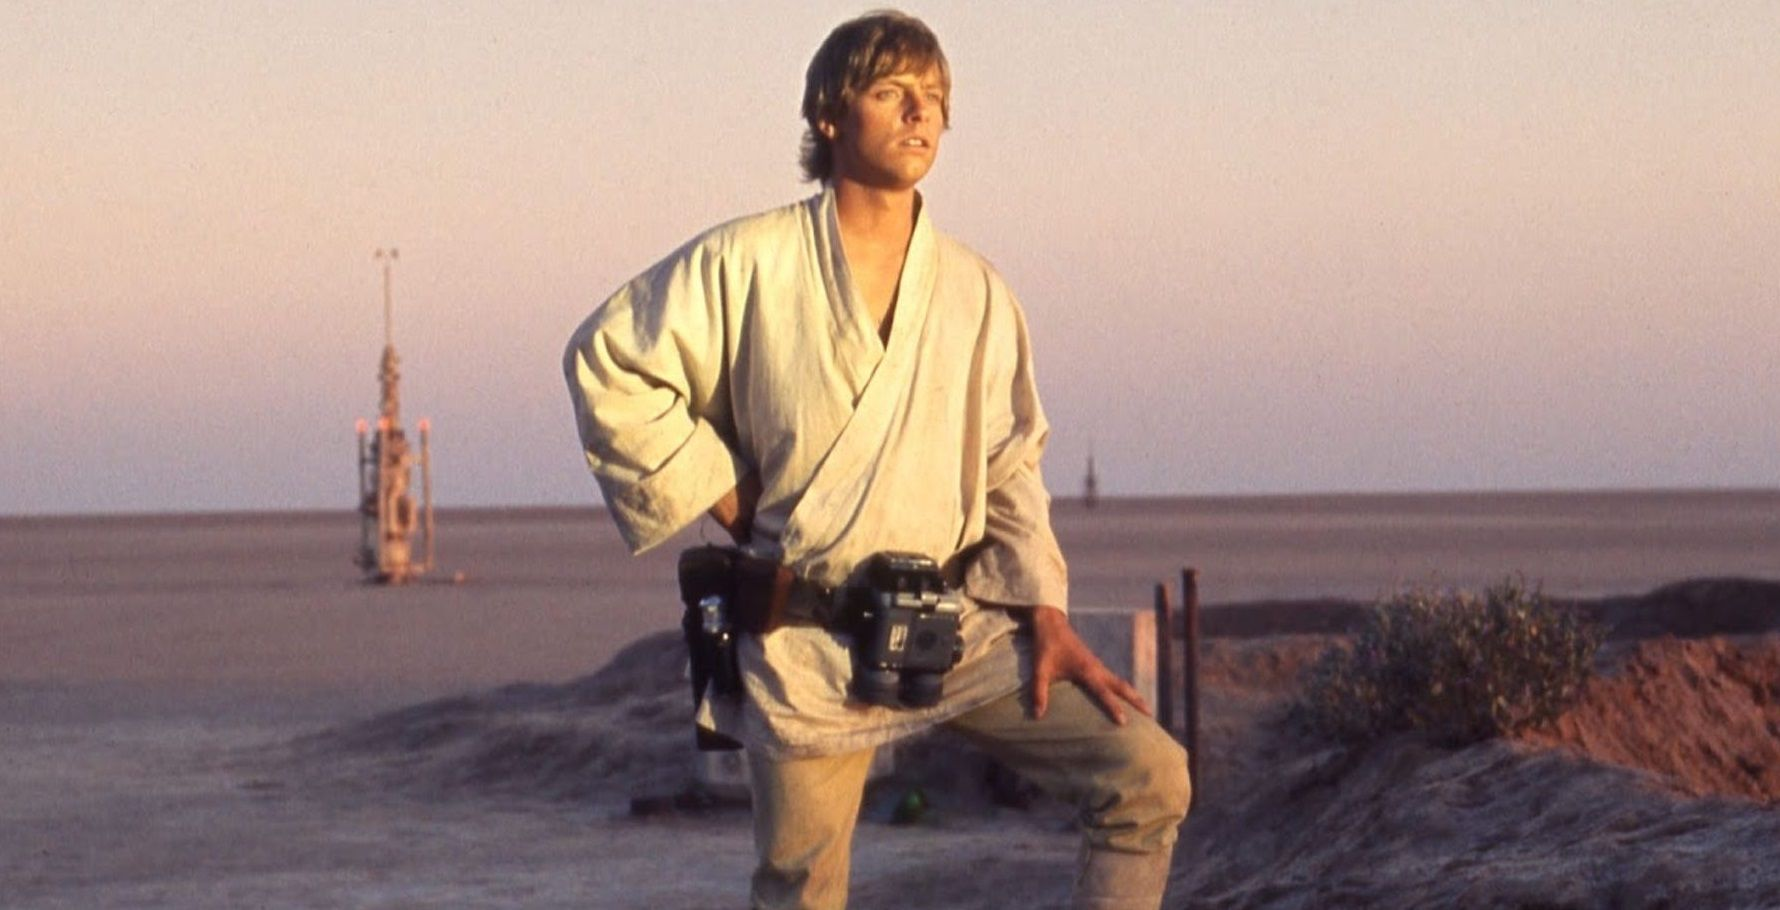 Star Wars: Luke Skywalker's 5 Funniest (And 5 Saddest) Moments